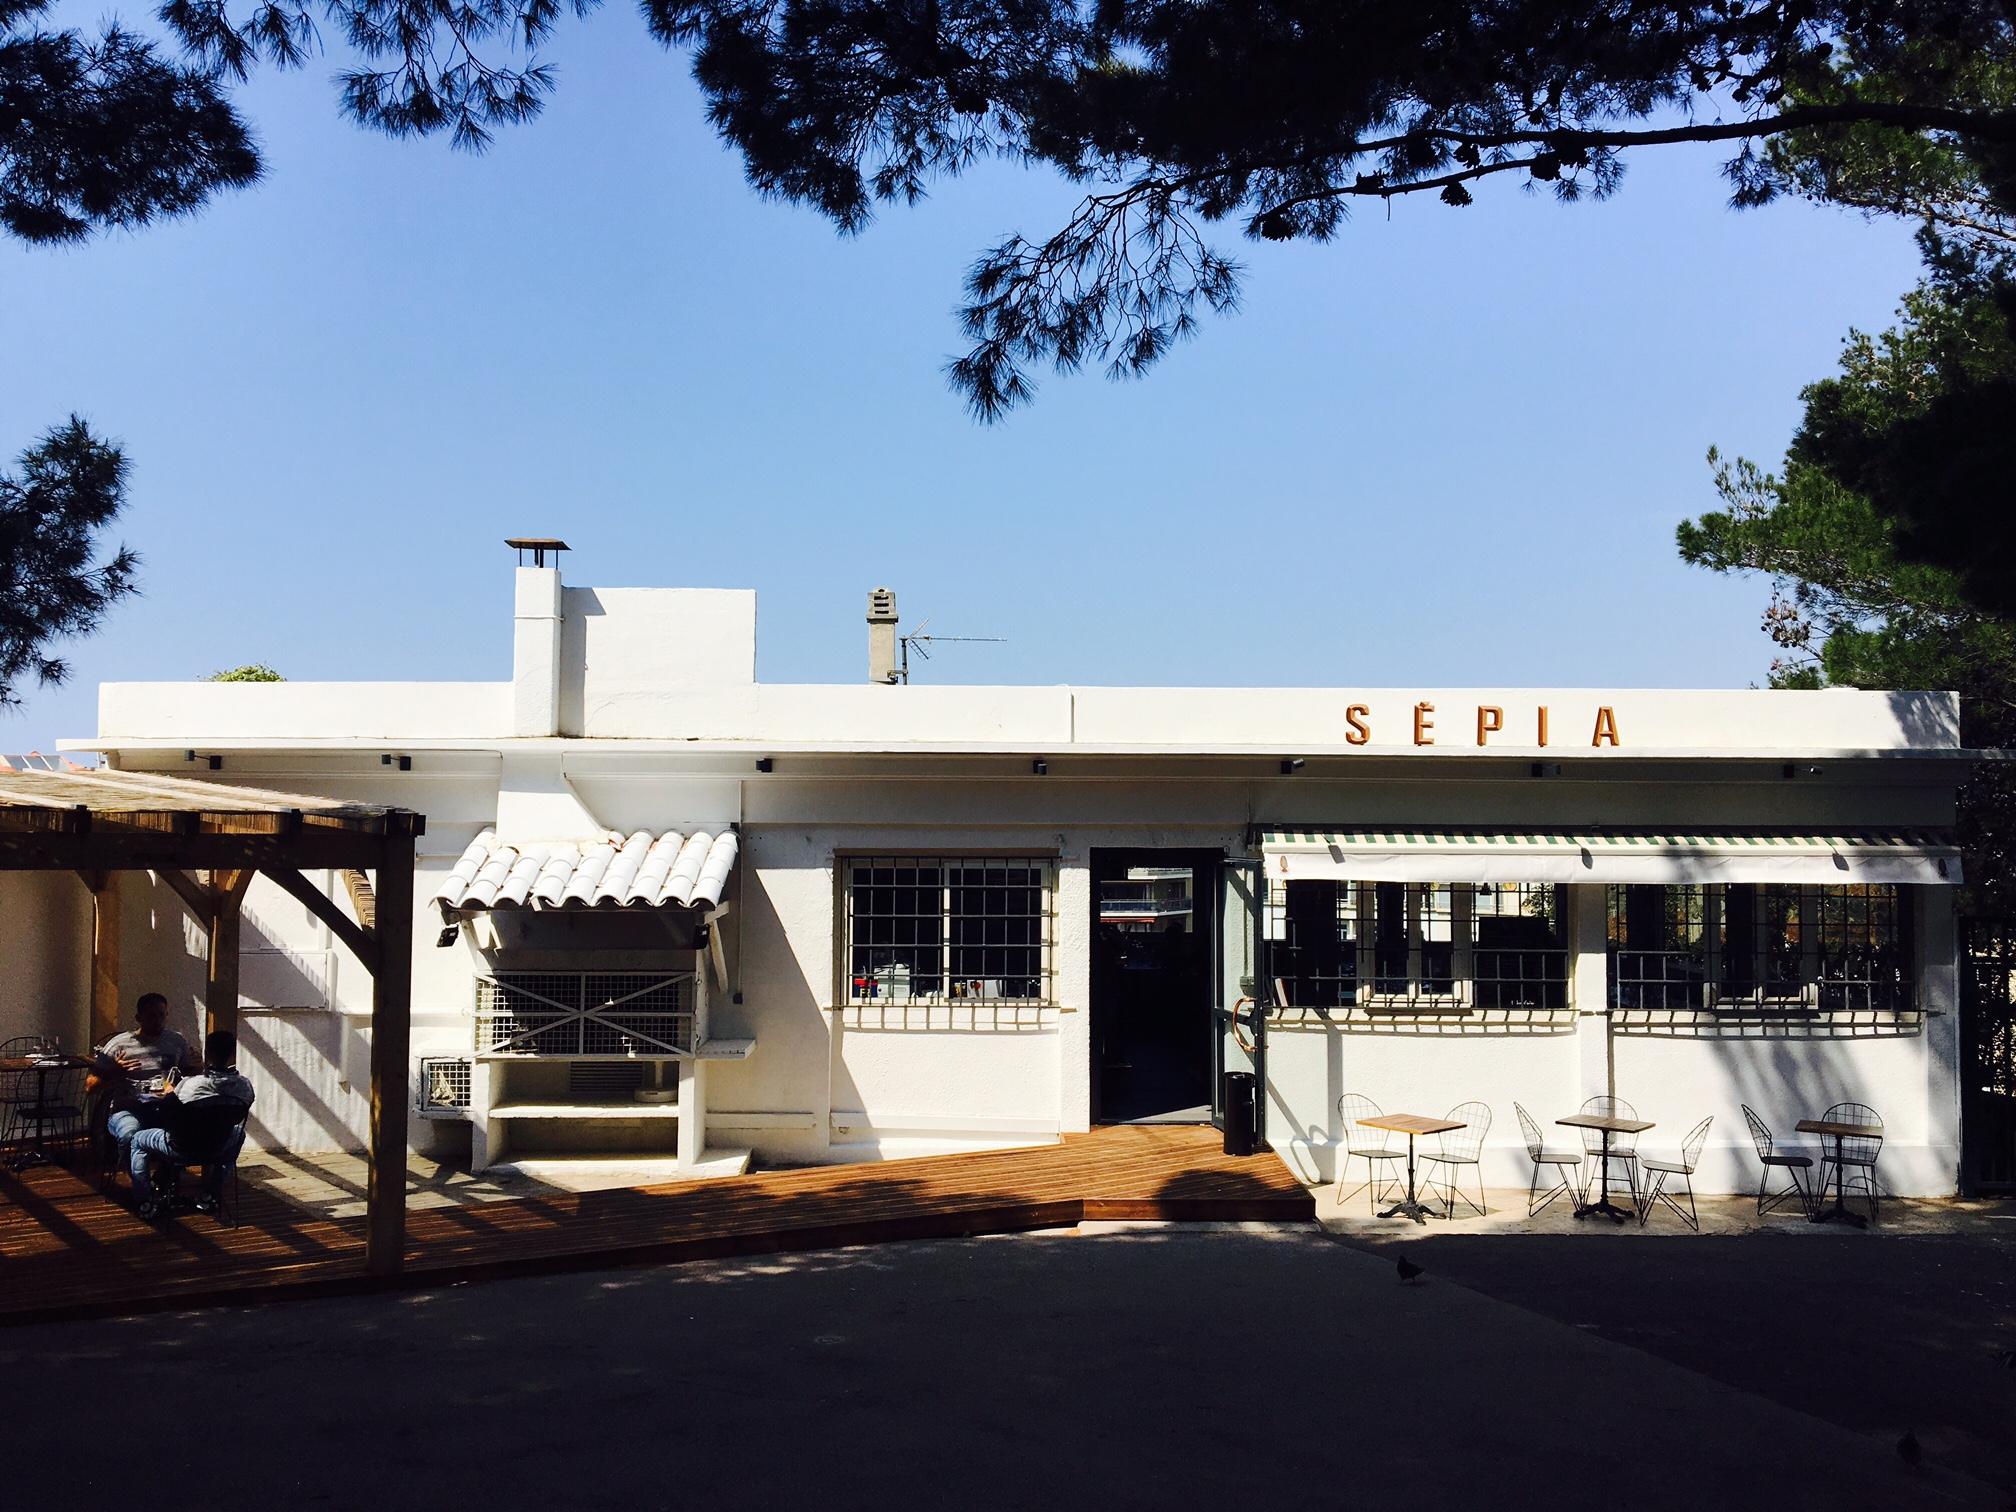 Mediterranean restaurant marseille sepia love spots for Restaurant le jardin marseille